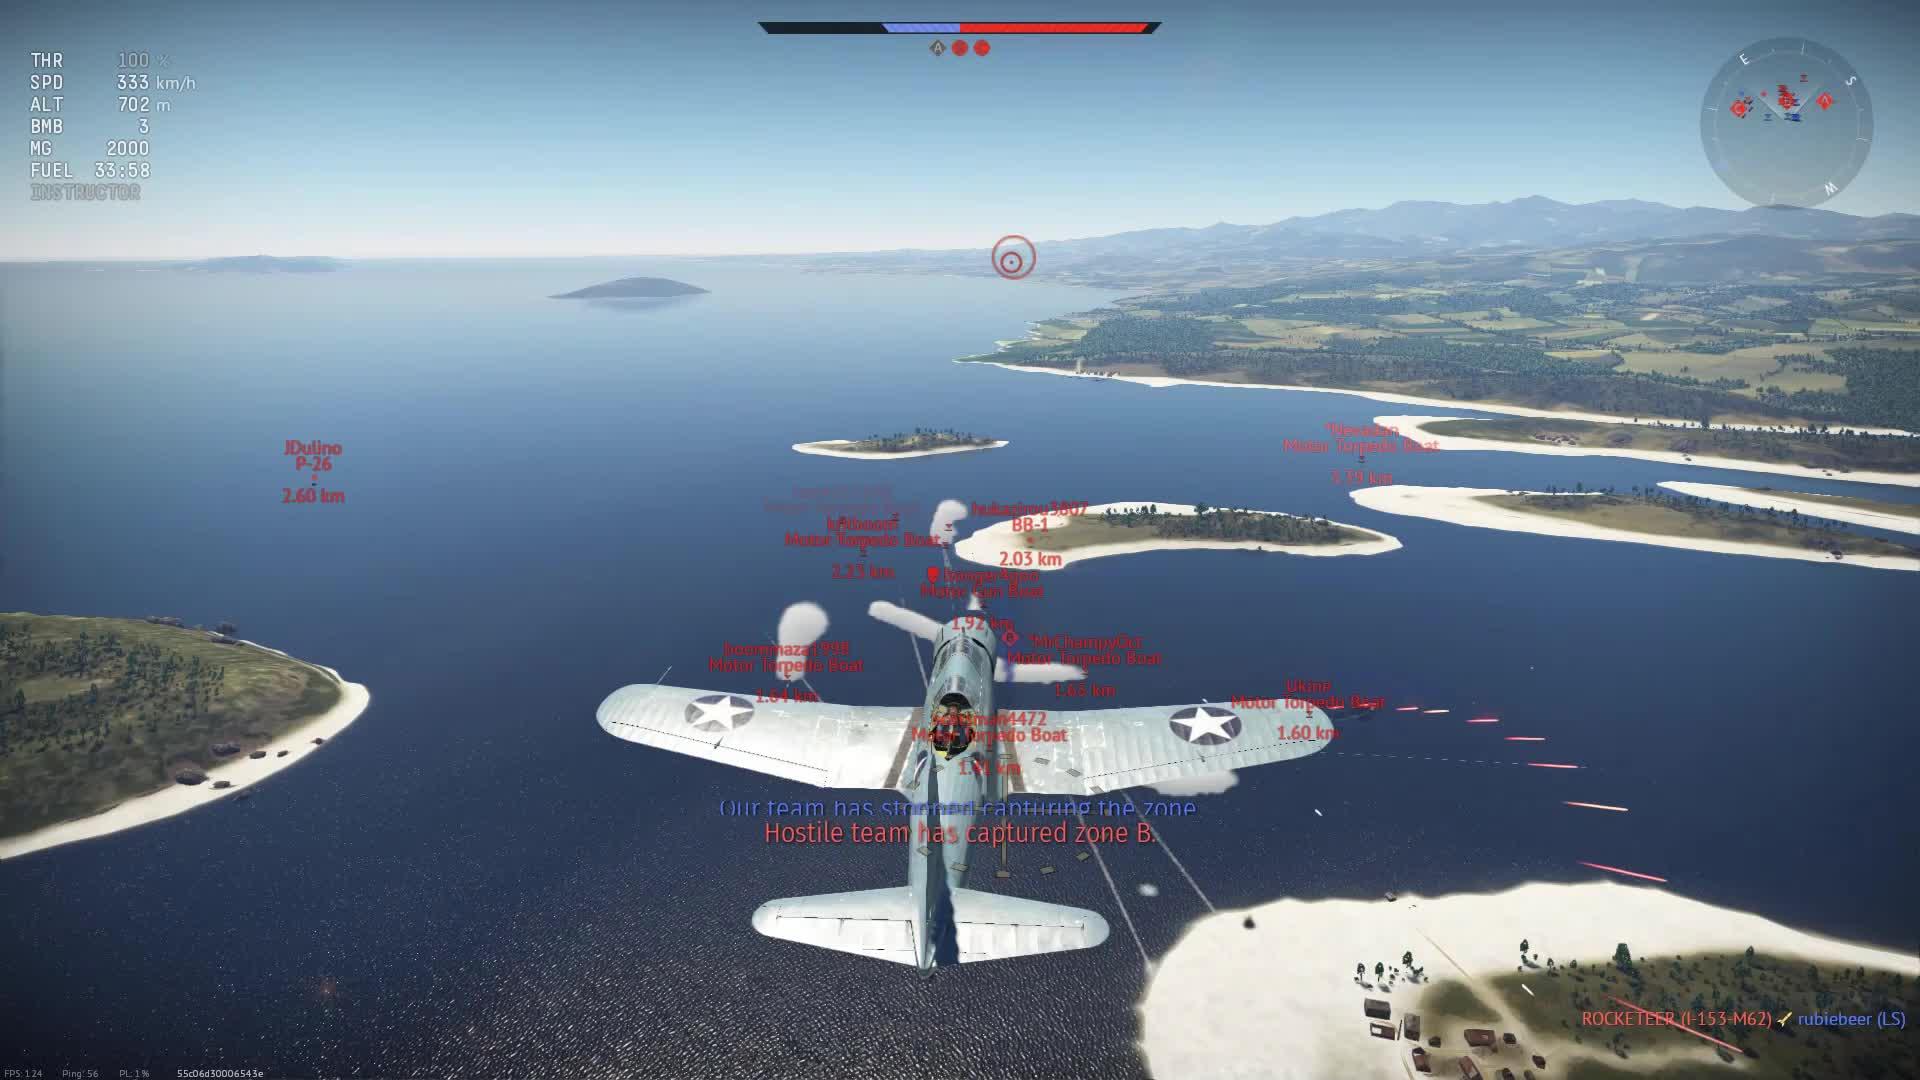 warthunder, Planes just seem a bit powerful GIFs